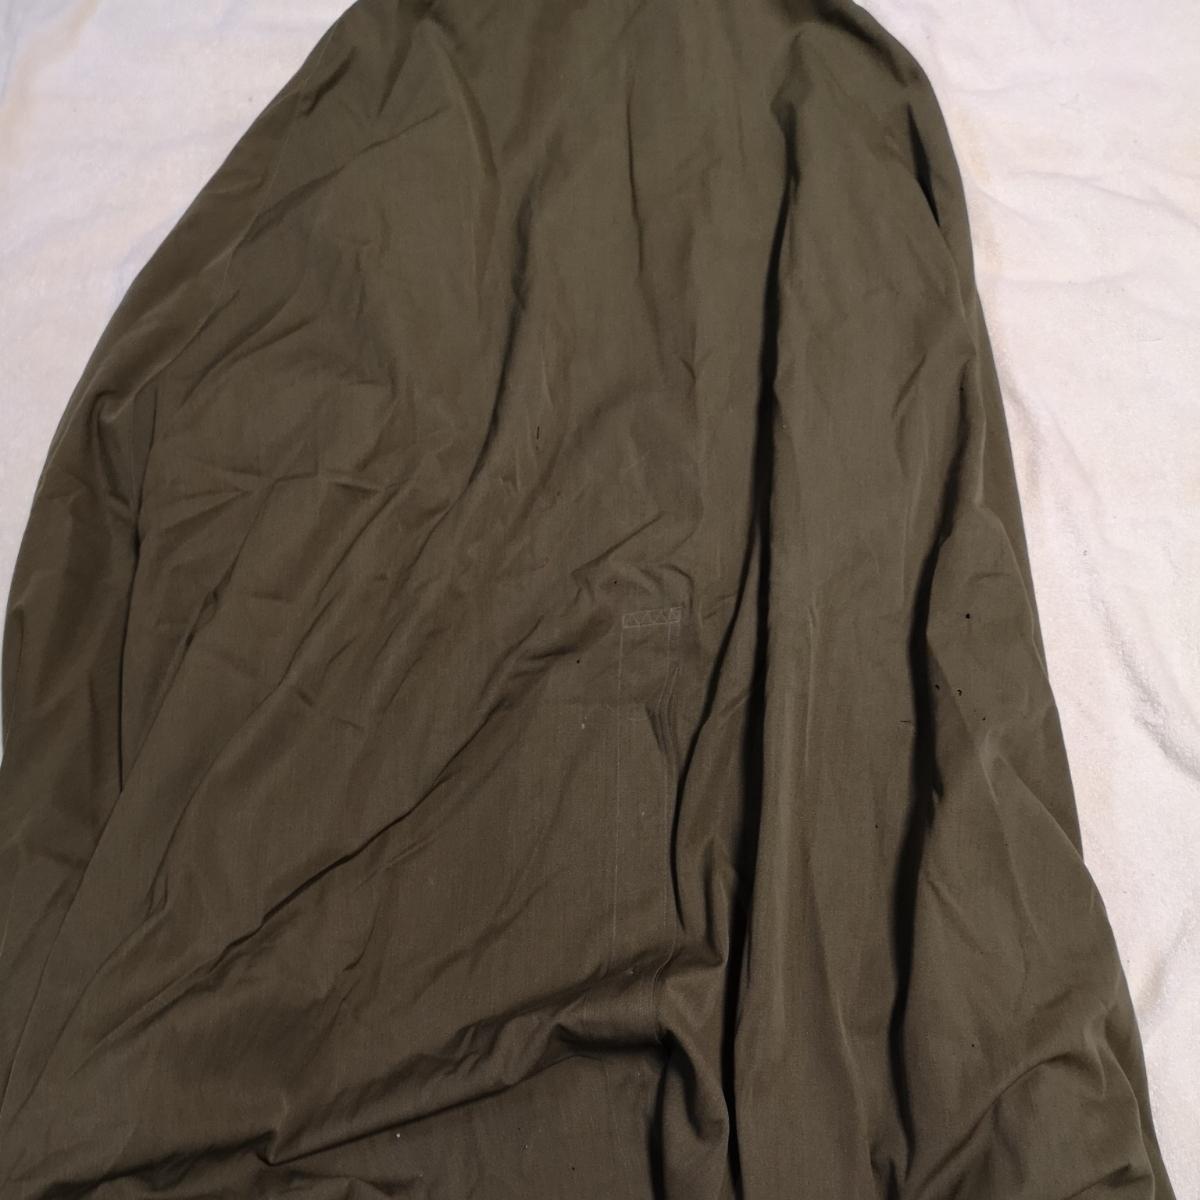 日本軍 将校マント 少尉 外套 襟章付き 戦前 洋品店仕立 軍服_画像9